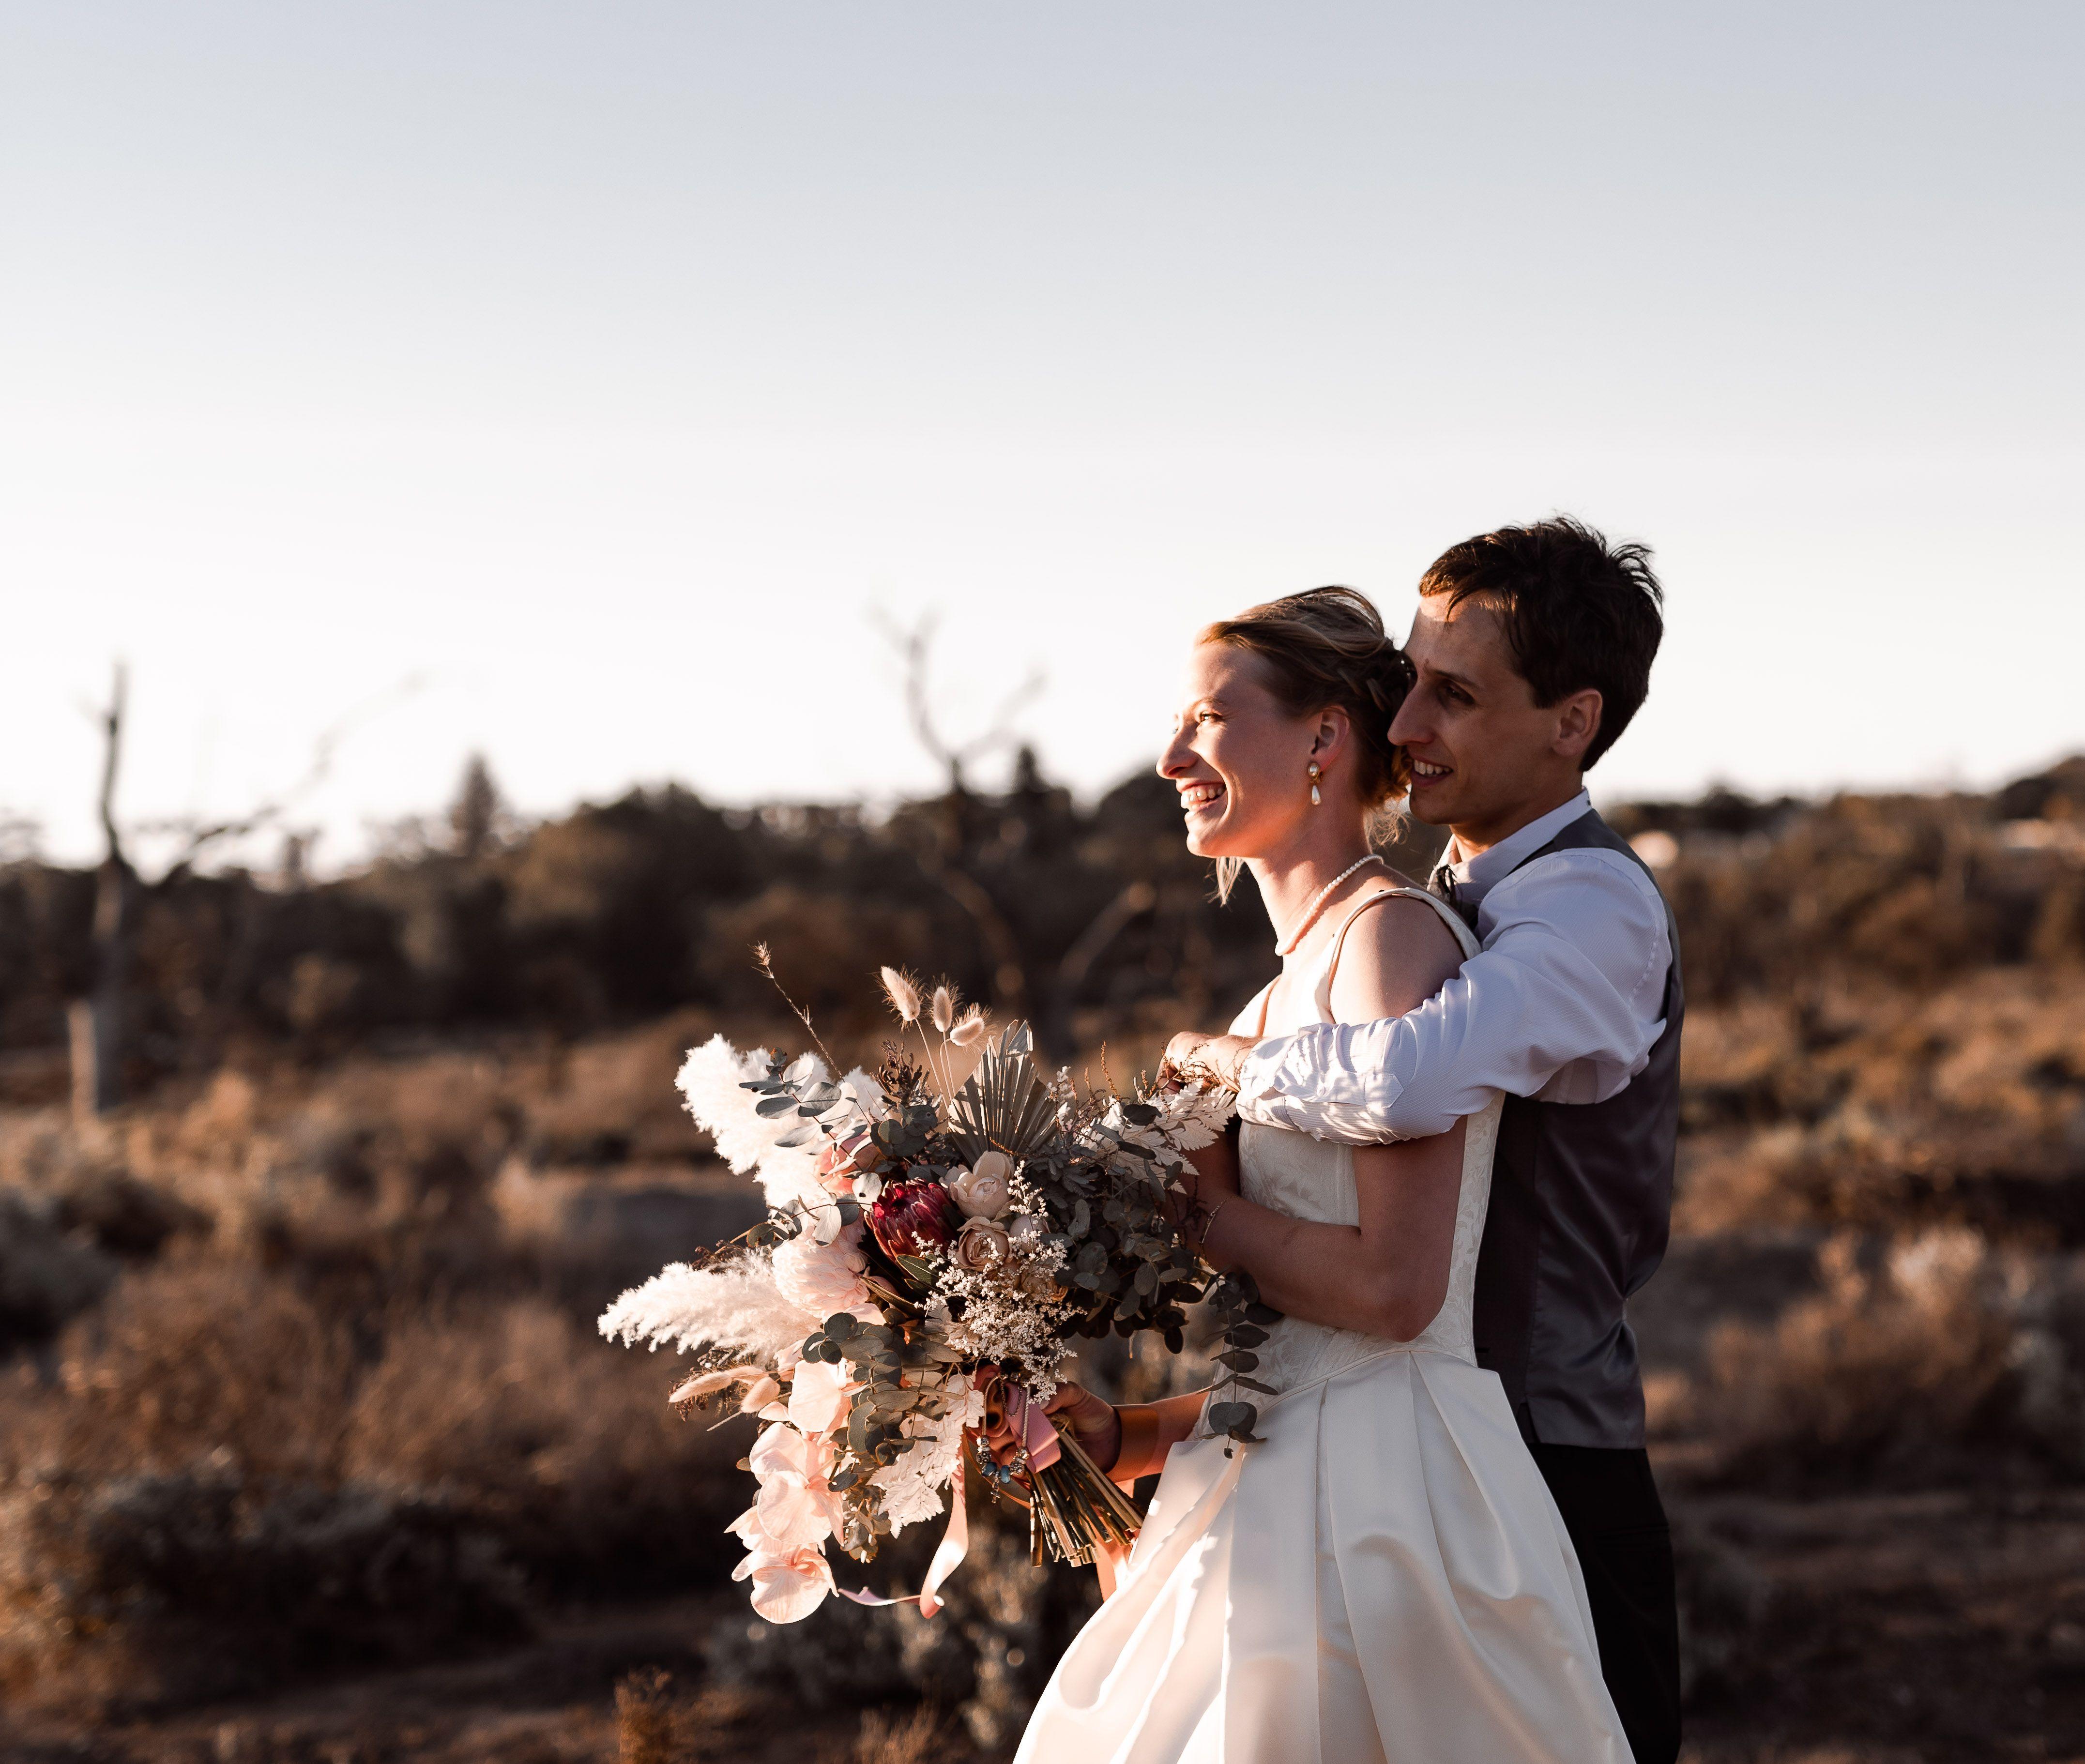 Vintage Wedding In 2020 Vintage Wedding Photography Elope